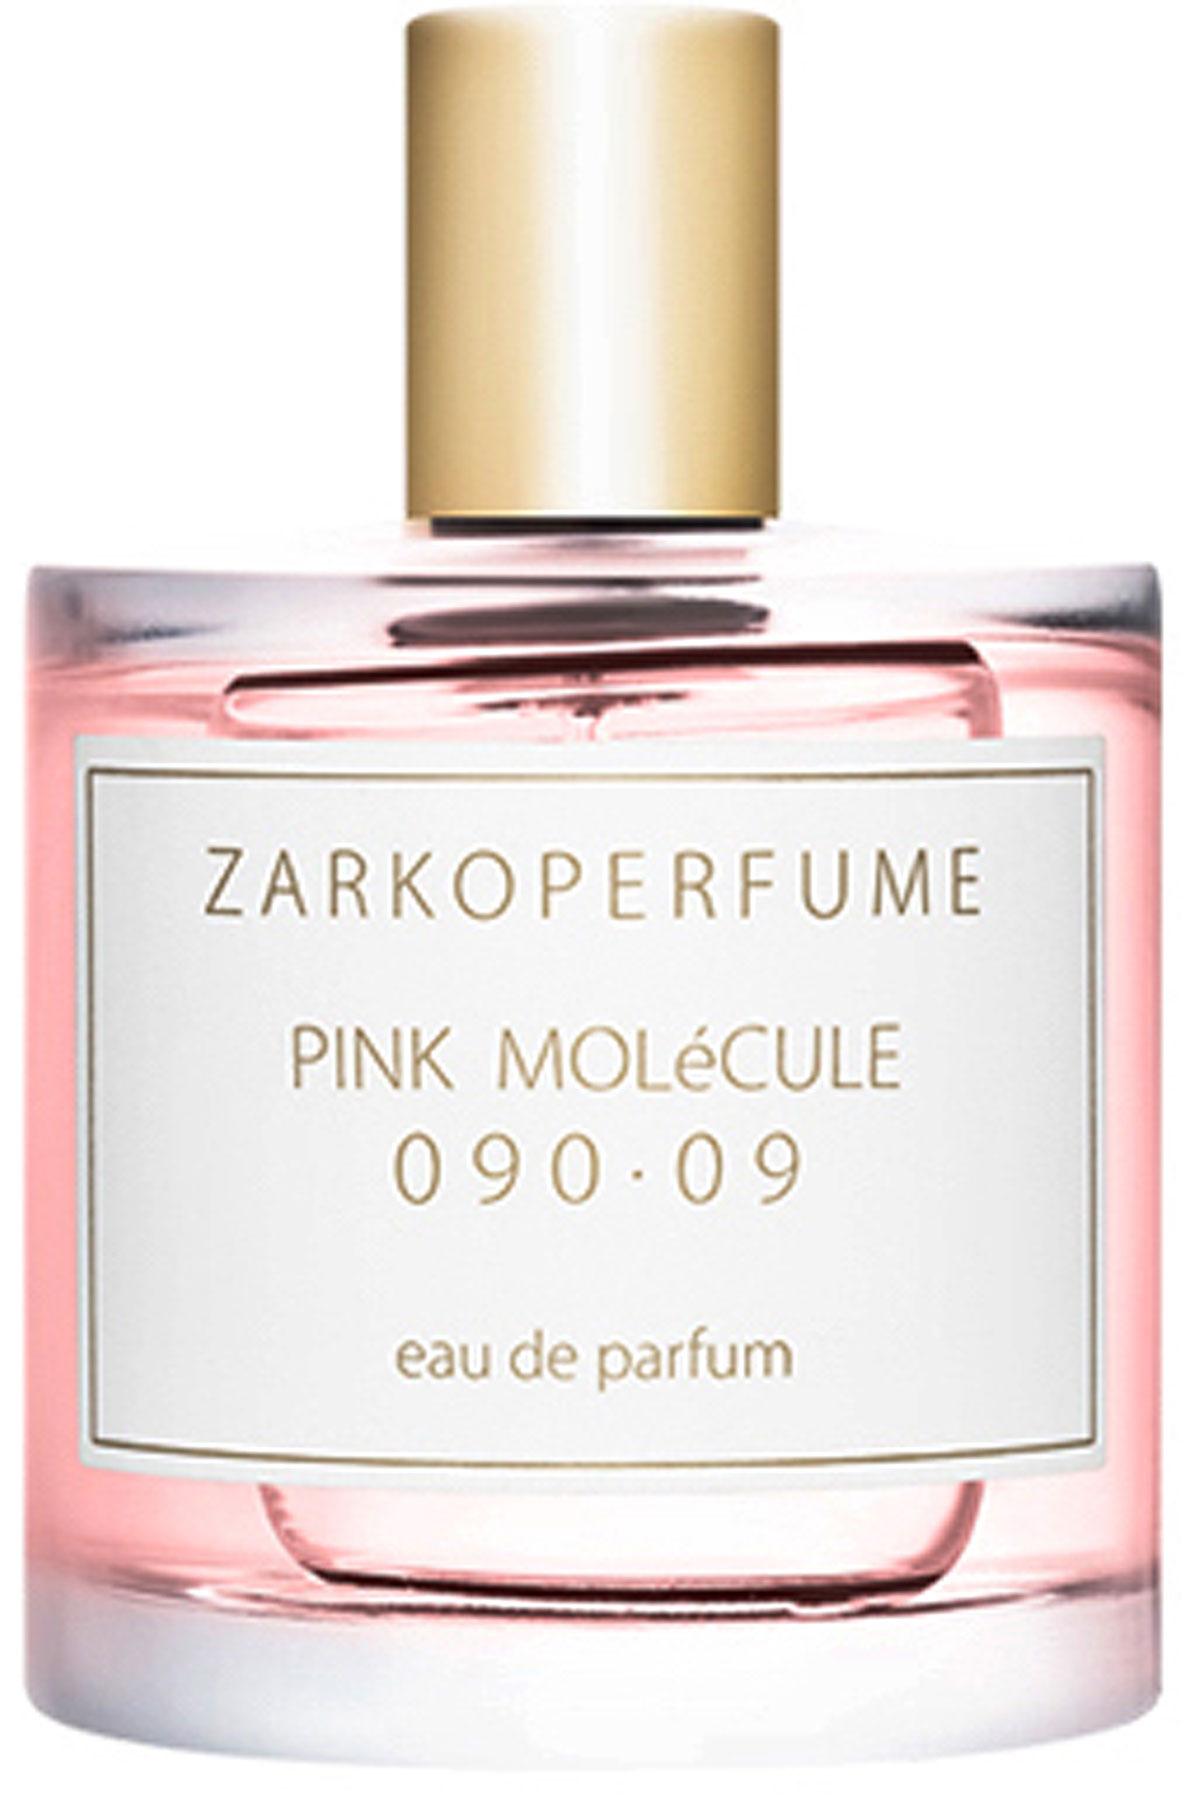 Zarkoperfume Fragrances for Men, Pink Molecule 090.09 - Eau De Parfum - 100 Ml, 2019, 100 ml